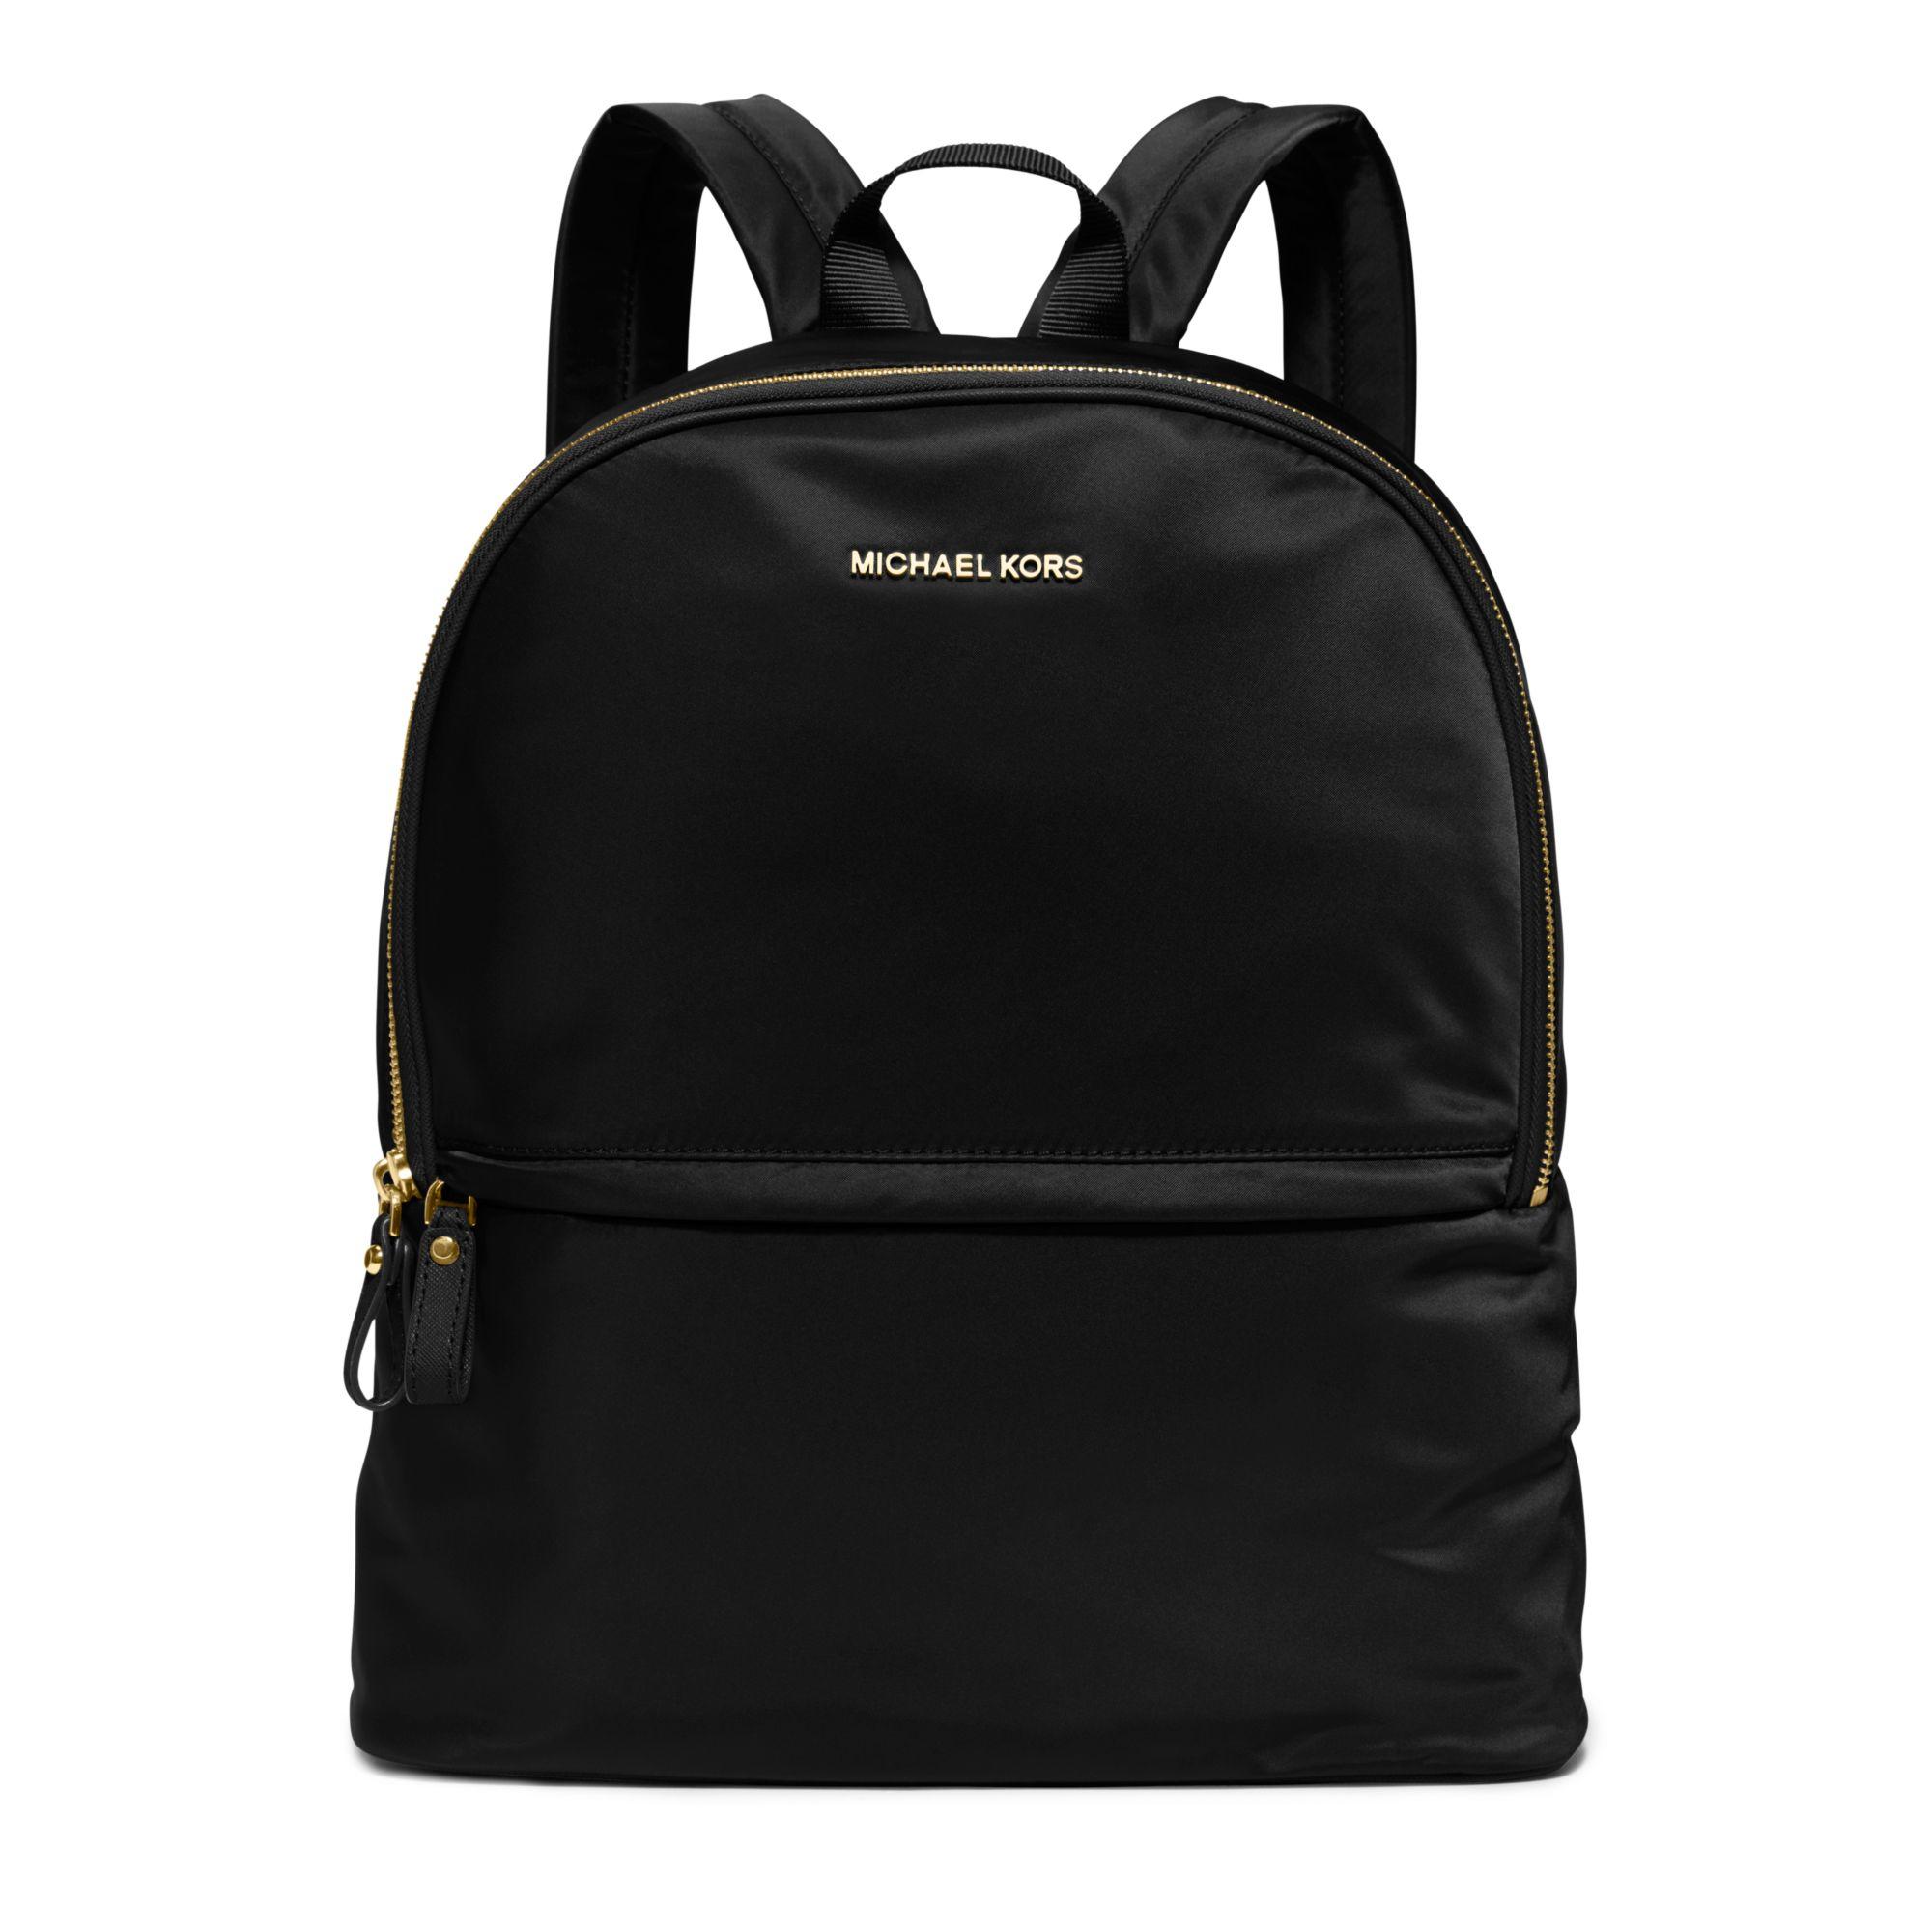 Lyst - Michael Kors Kieran Large Nylon Backpack in Black